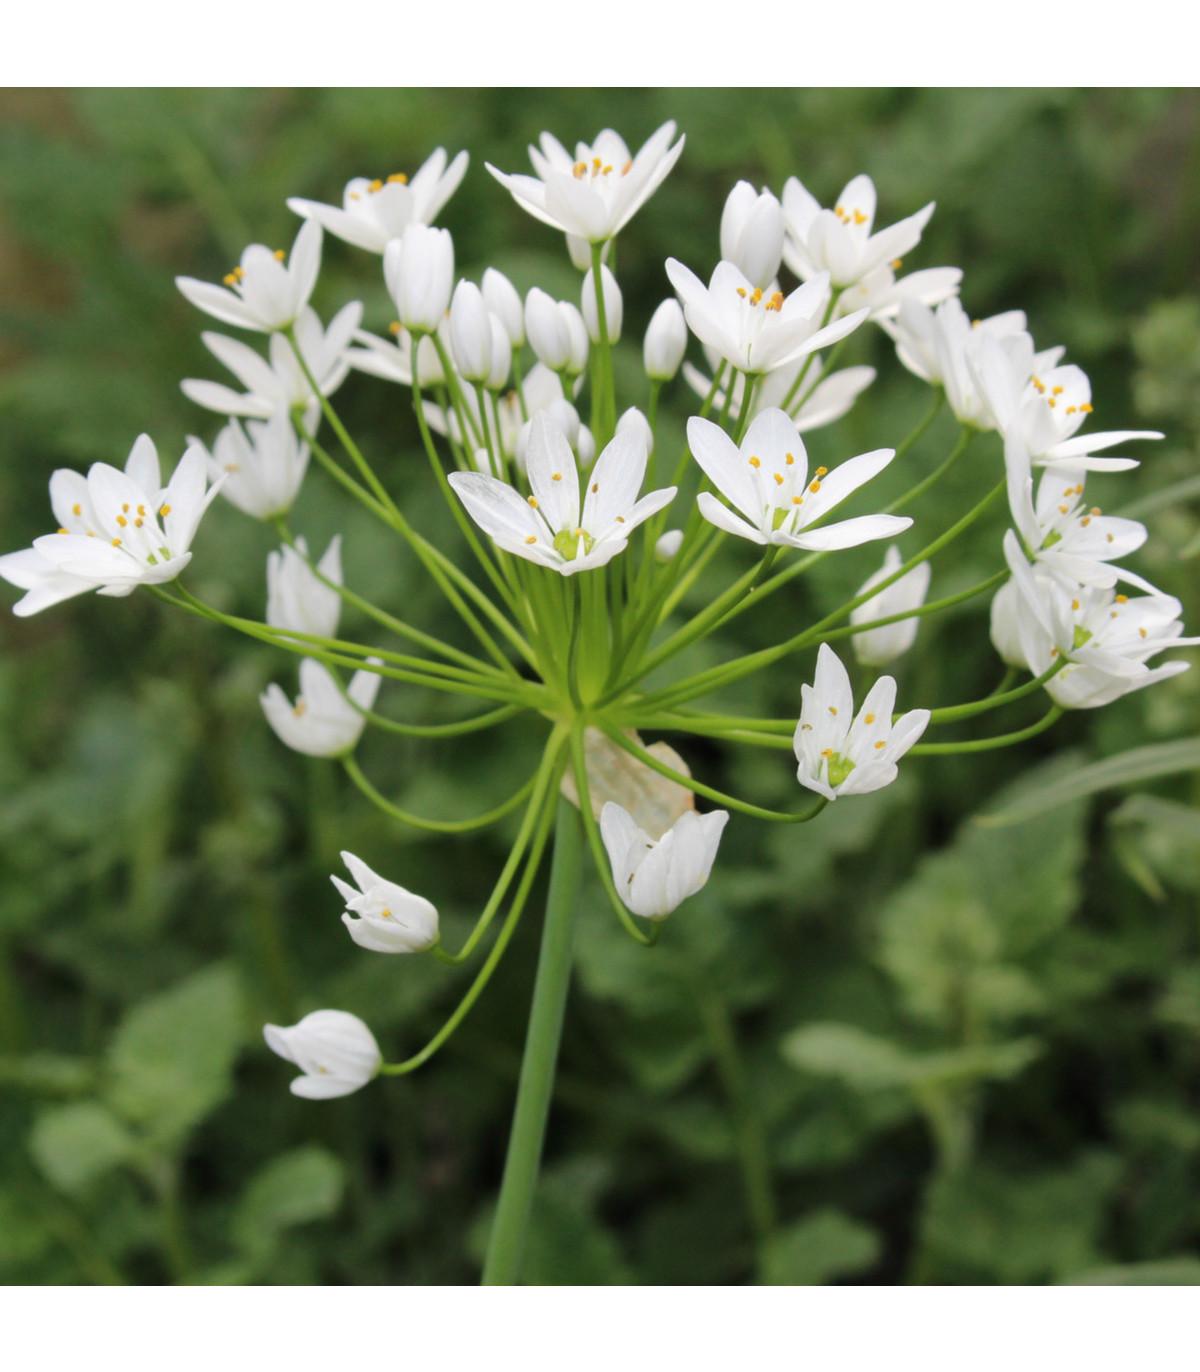 Cesnak okrasný - Allium neapolitanum - predaj cibuliek - 3 ks